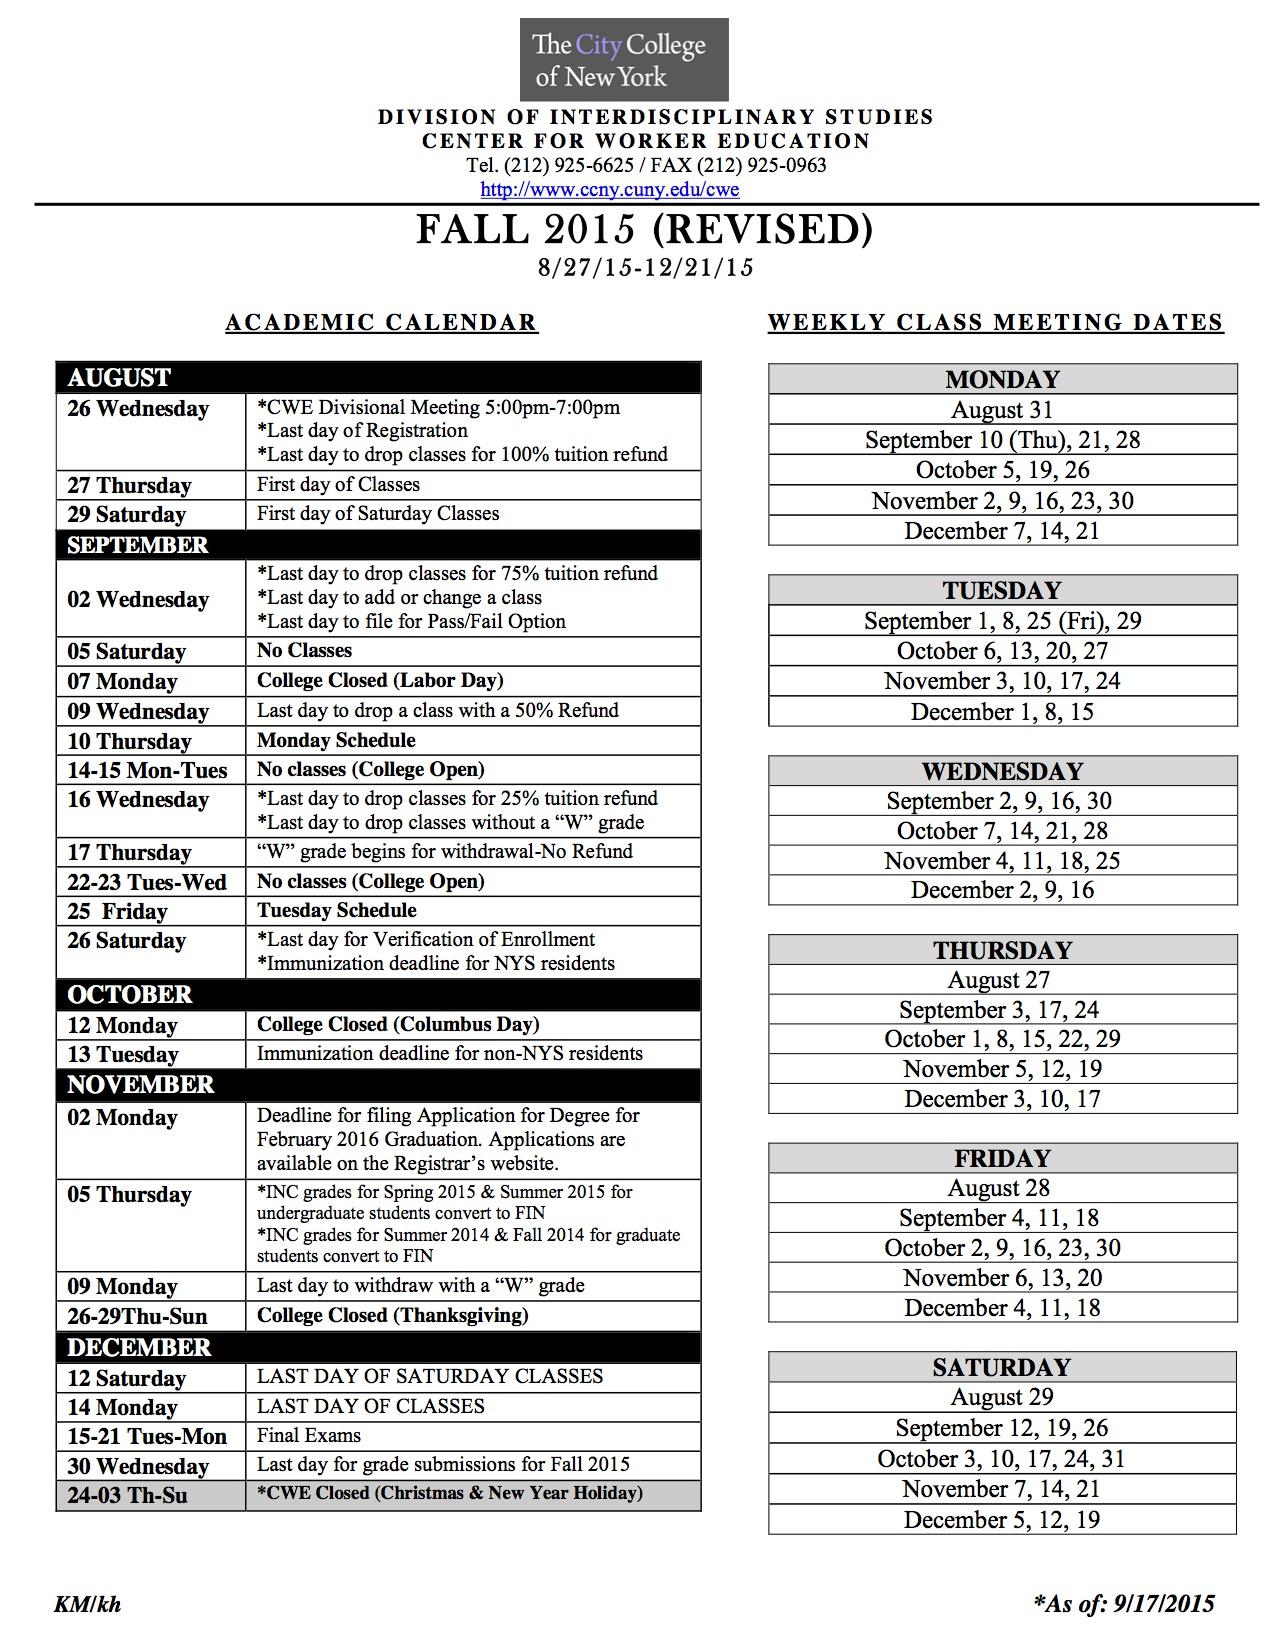 Academic Calendar | The City College Of New York Inside Staten Island College Callendar